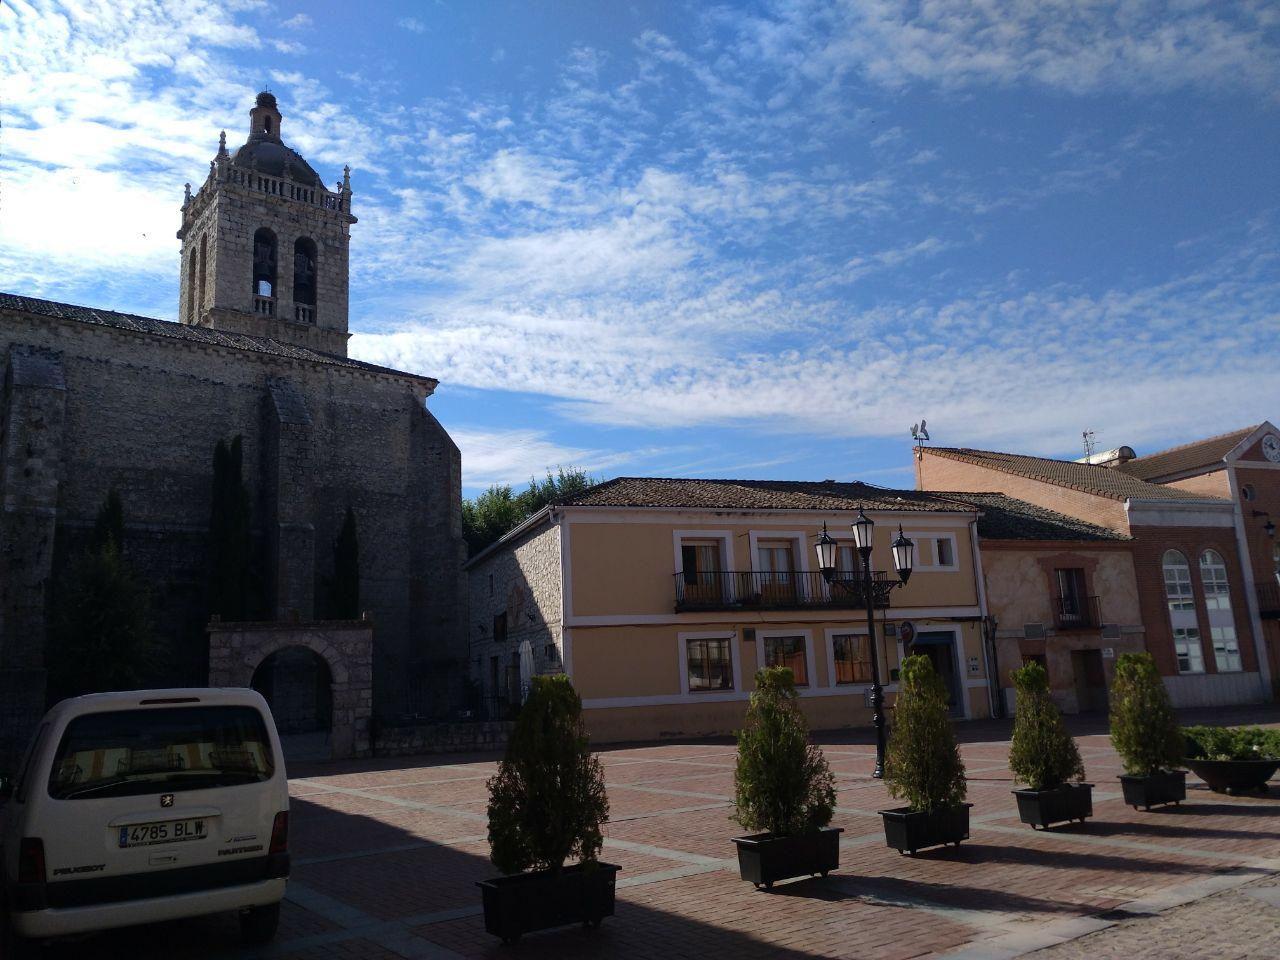 Plaza Mayor de Aldeamayor, con la soberbia Iglesia de San Martín de Tours a la izquierda.